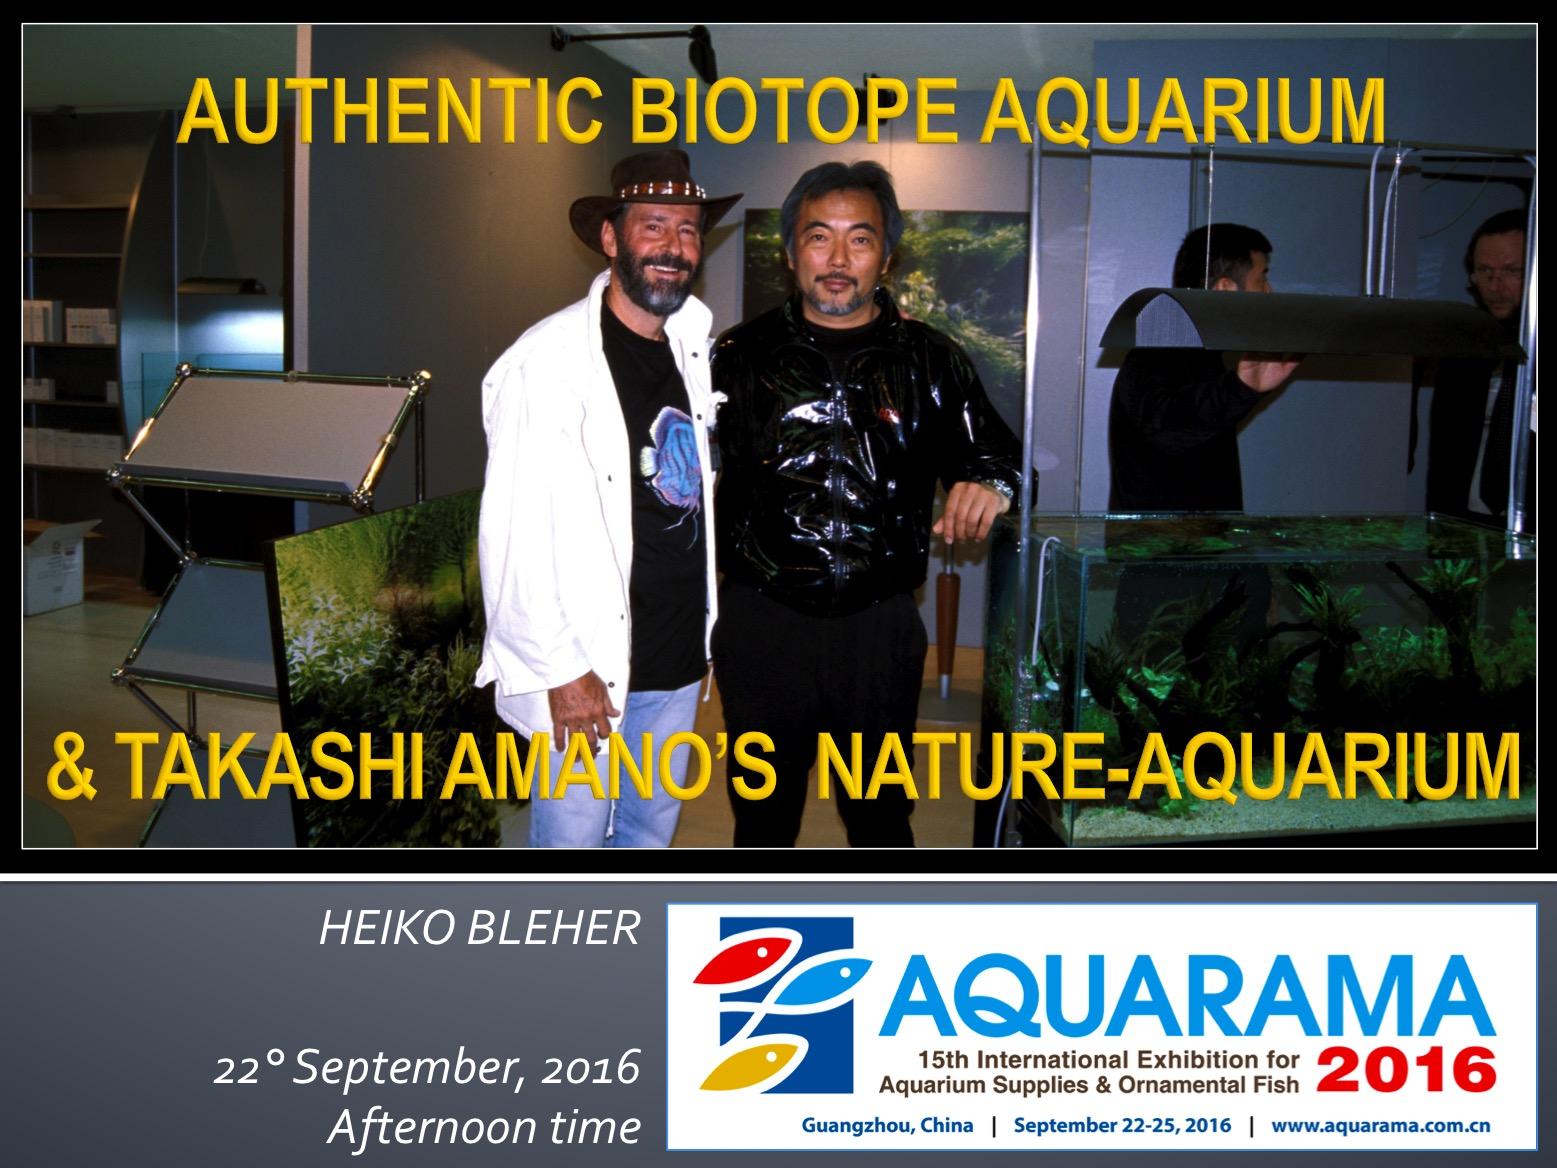 Biotope aquarium_Aquarama_Guangzhou 2016